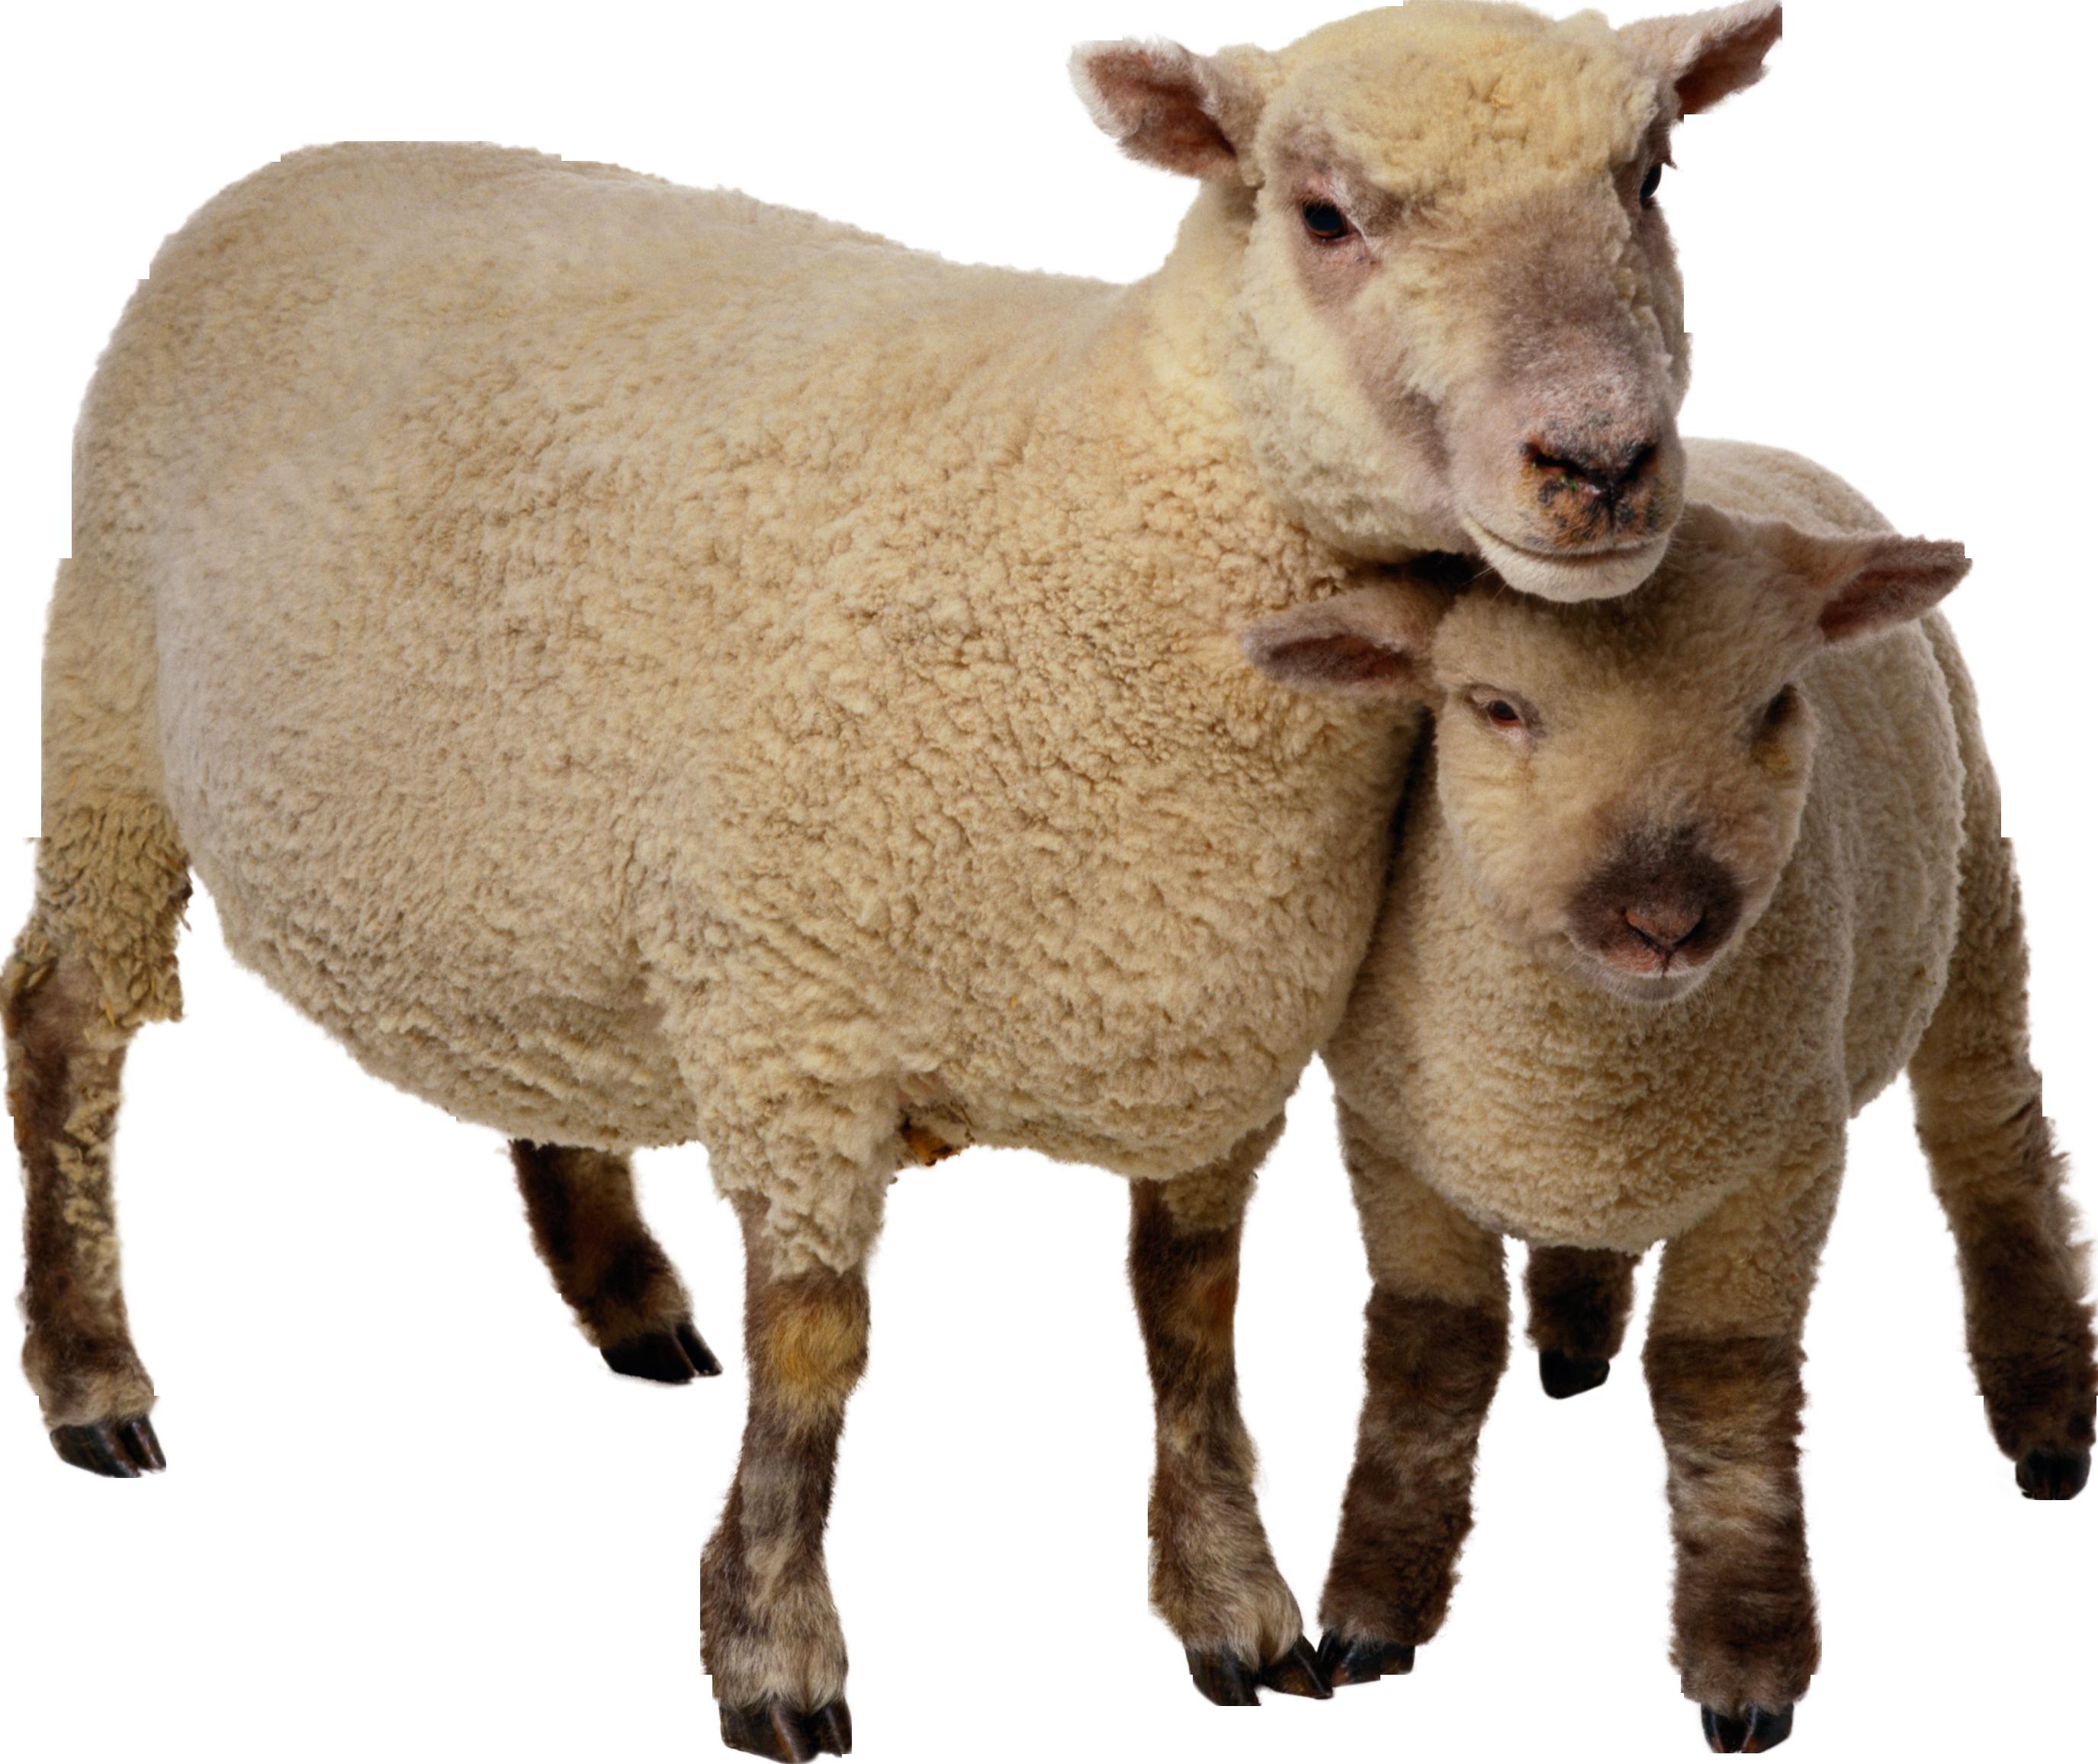 Sheep PNG image, free download Animals, Png, Sheep